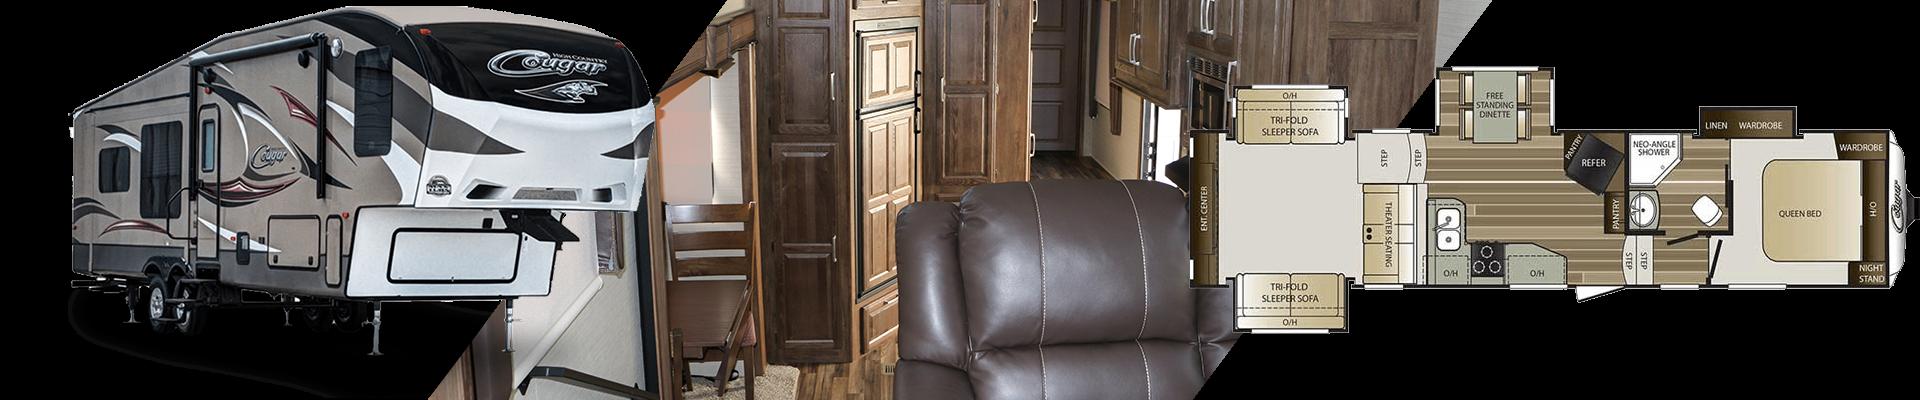 Keystone Cougar fifth wheel - interior, exterior and floorplan views.